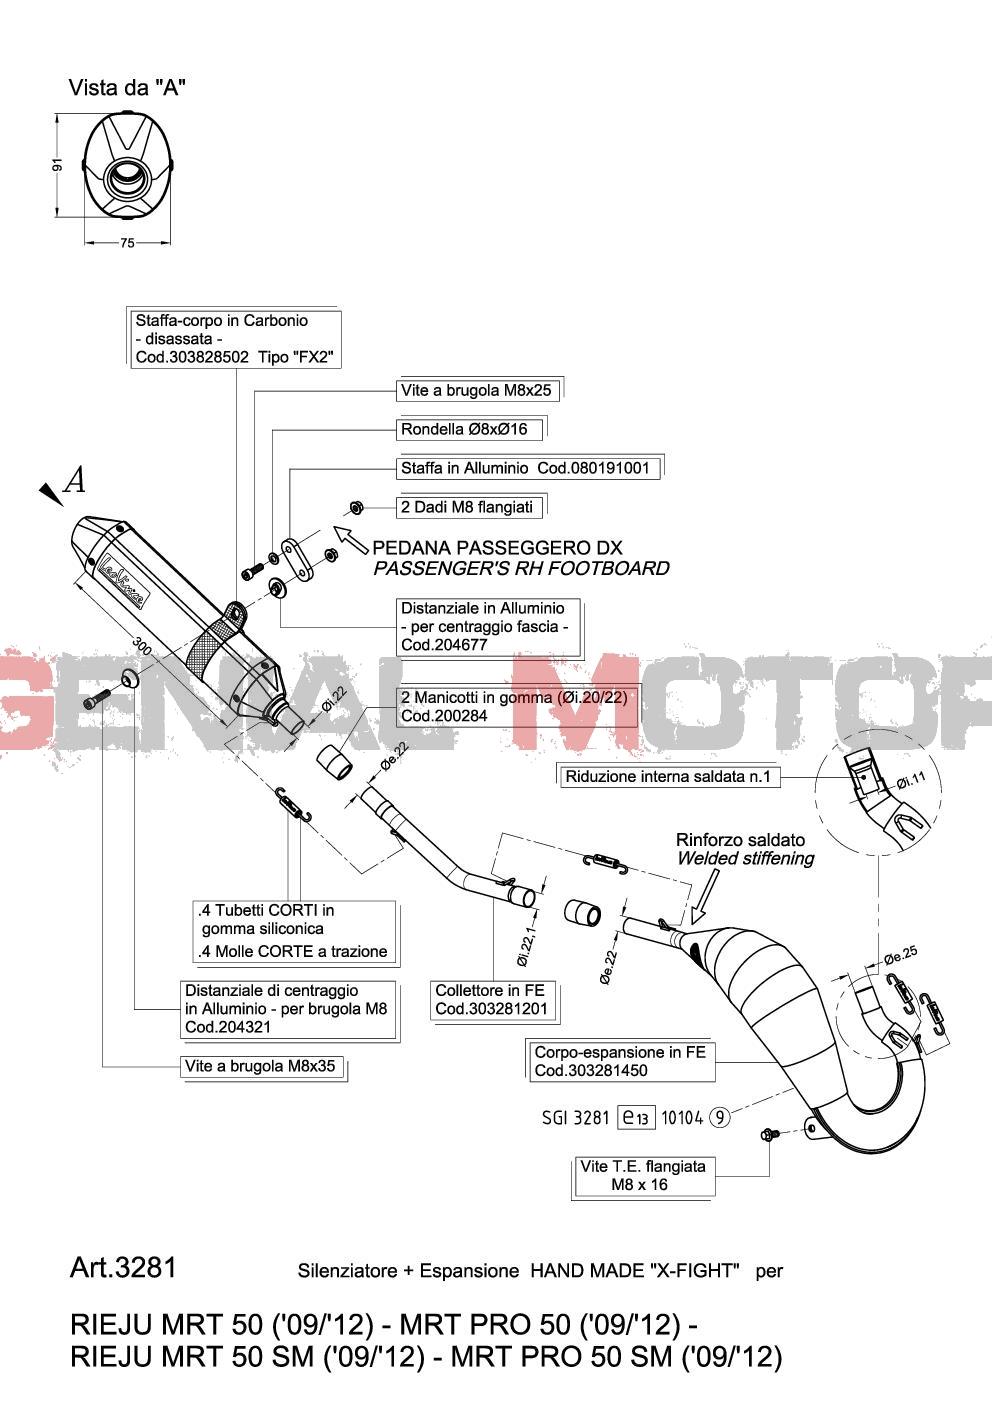 3281 Echappement Complete Leovince X-Fight Acier Rieju Mrt 50/Pro/Sm 2009 > 2012